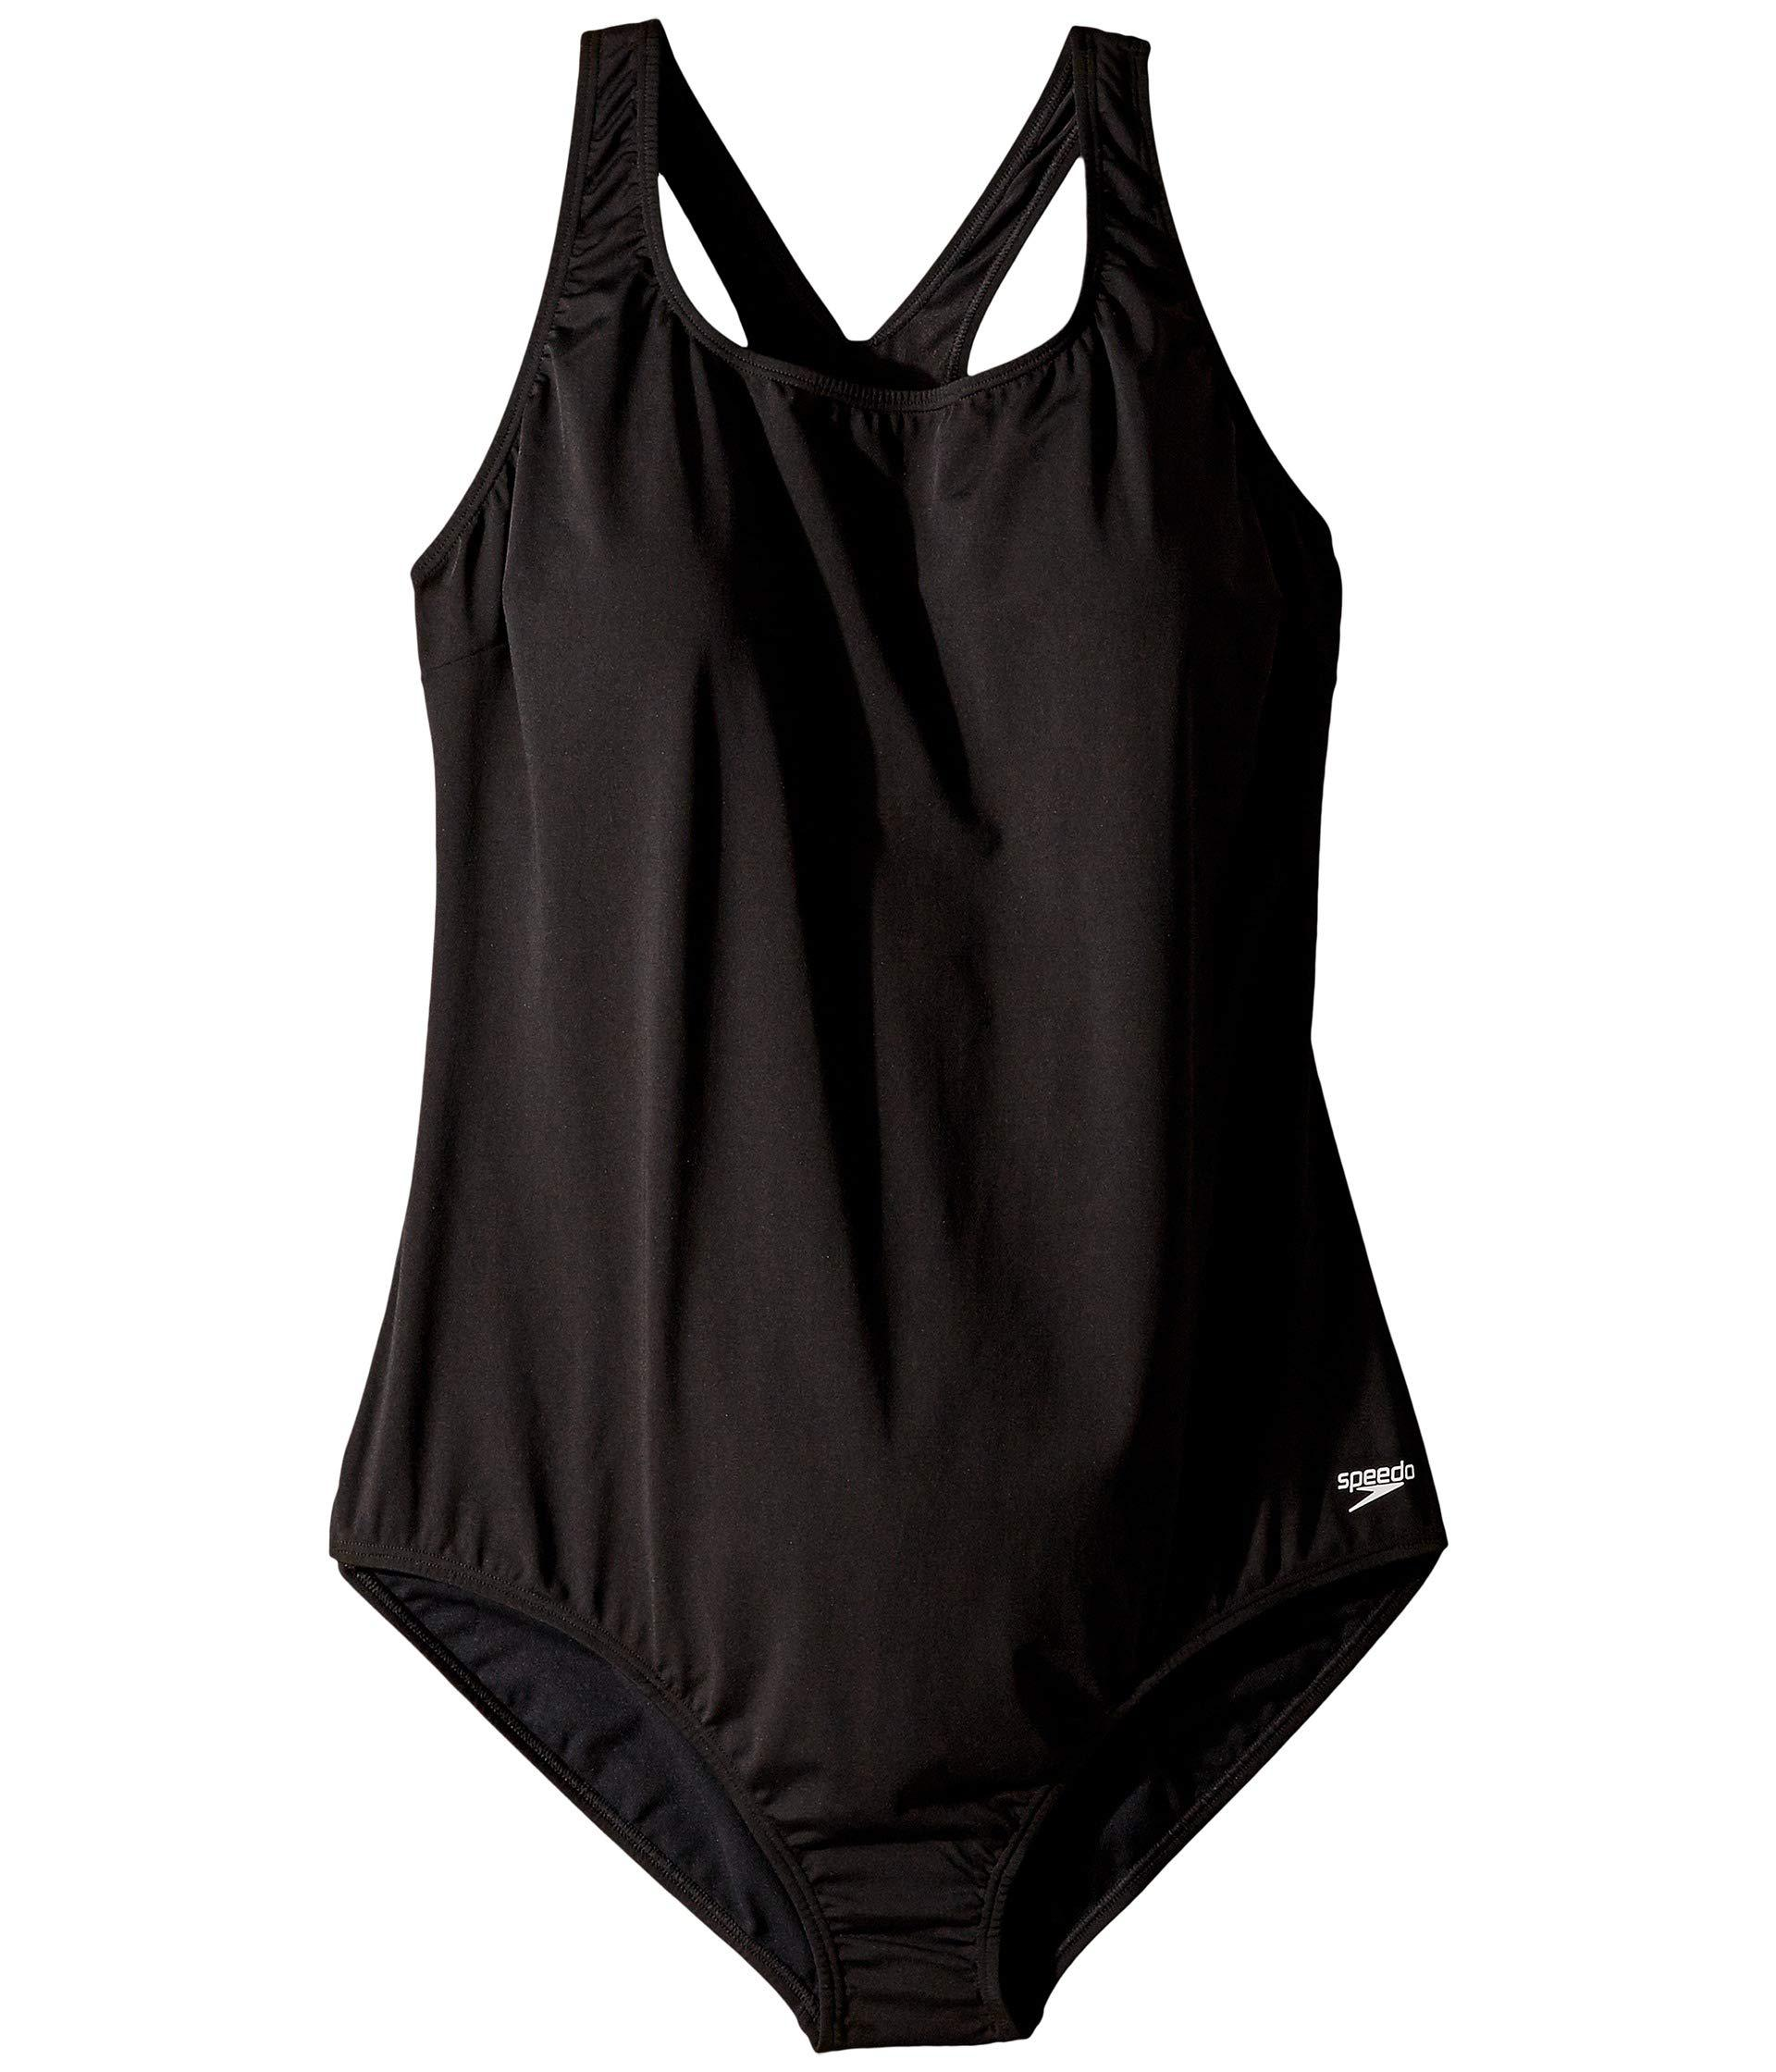 081a72c460892 Speedo - Plus Size Vanquisher Ultraback (black) Women s Swimsuits One Piece  - Lyst. View fullscreen